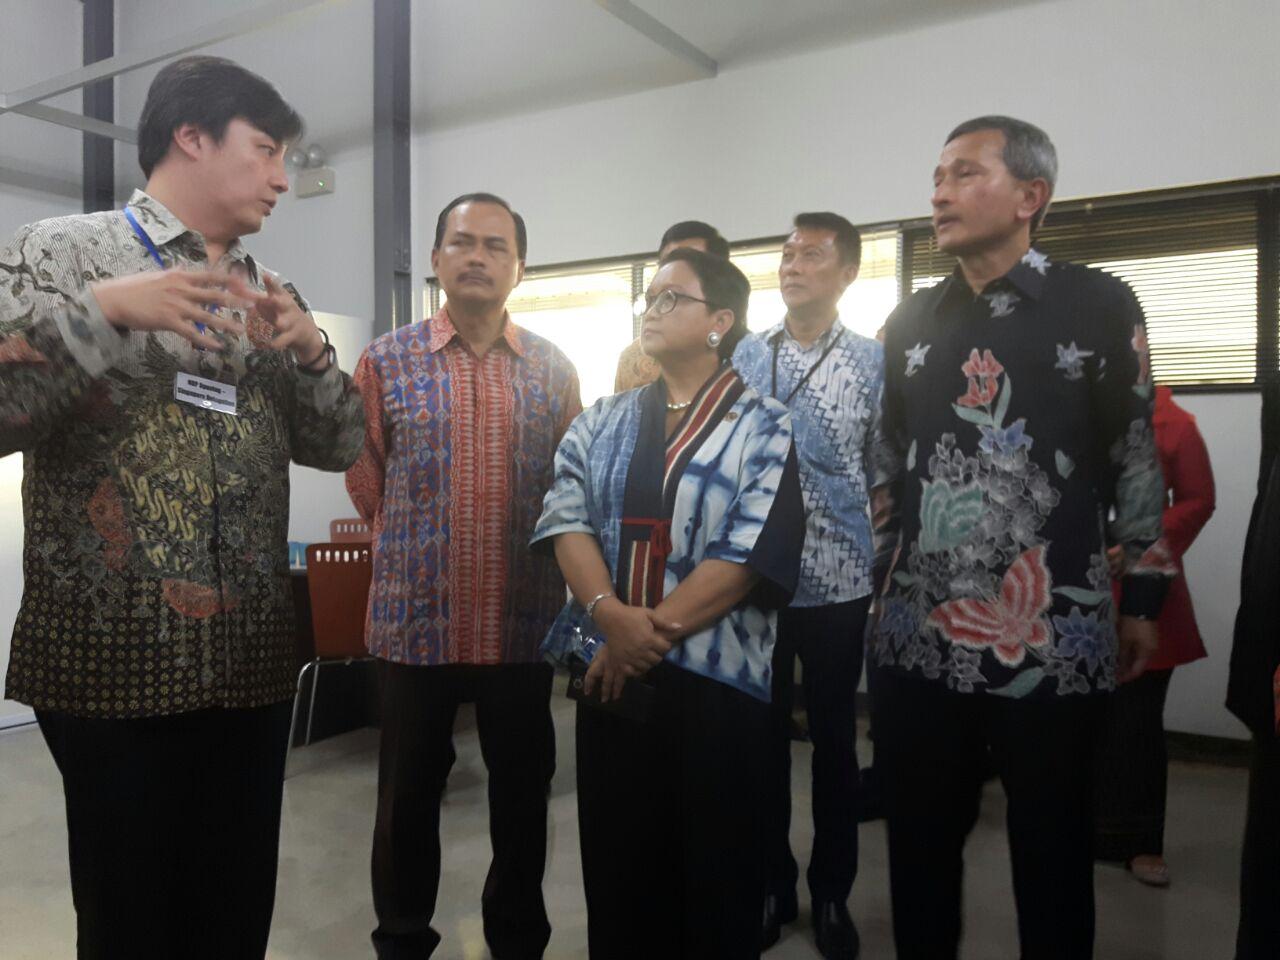 https: img-z.okeinfo.net content 2018 03 20 320 1875595 menteri-retno-resmikan-gerbang-ekonomi-digital-indonesia-ZzcCJ4Ez0M.jpg